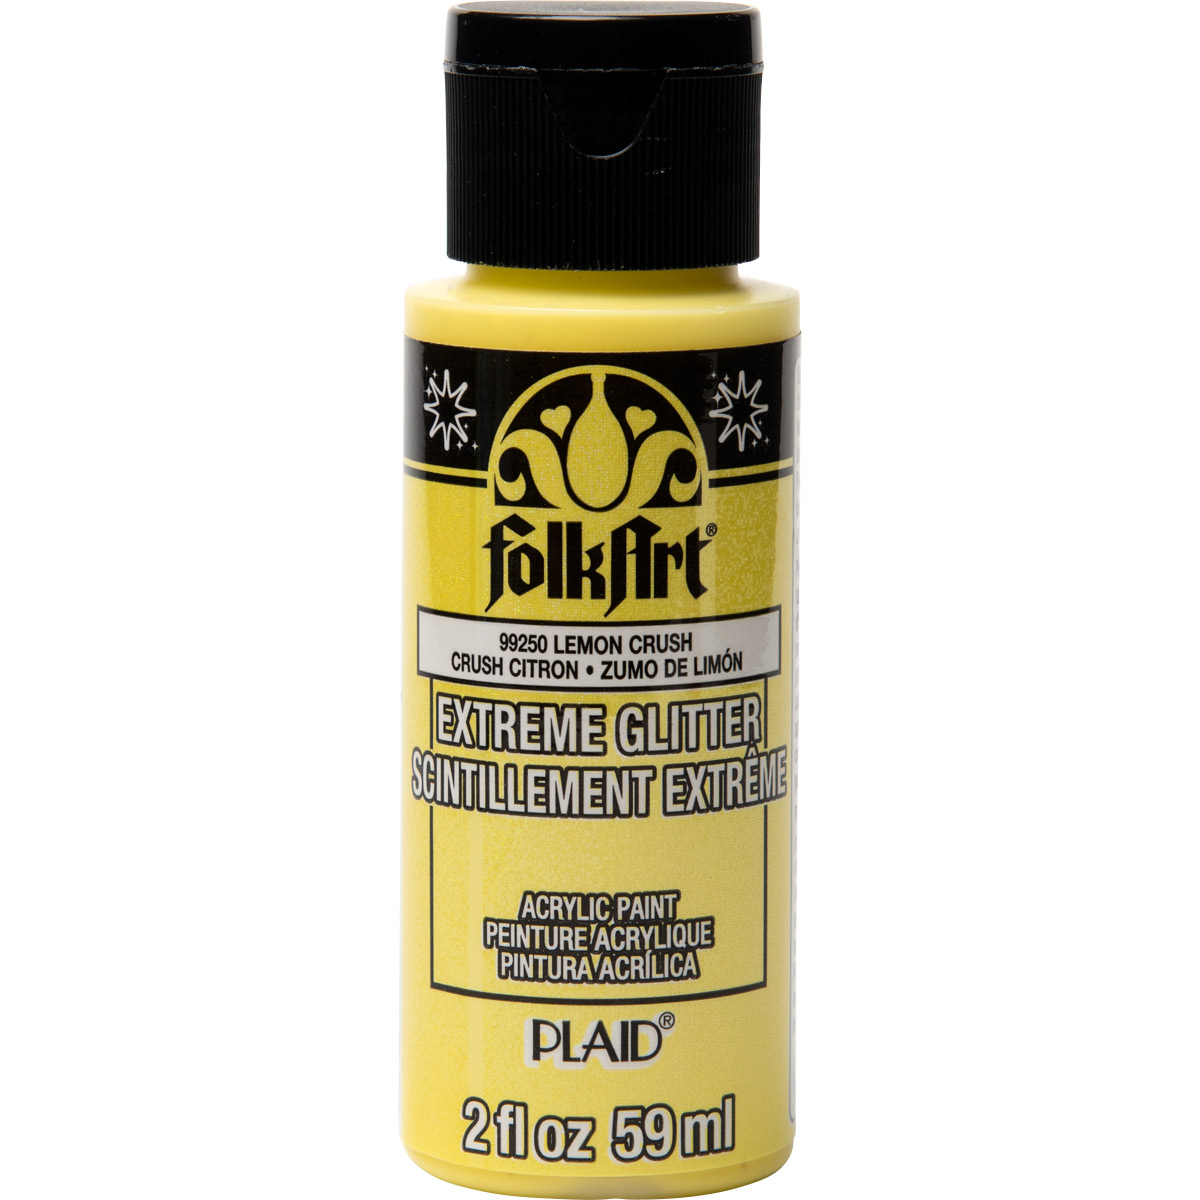 FolkArt ® Extreme Glitter™ - Lemon Crush, 2 oz.